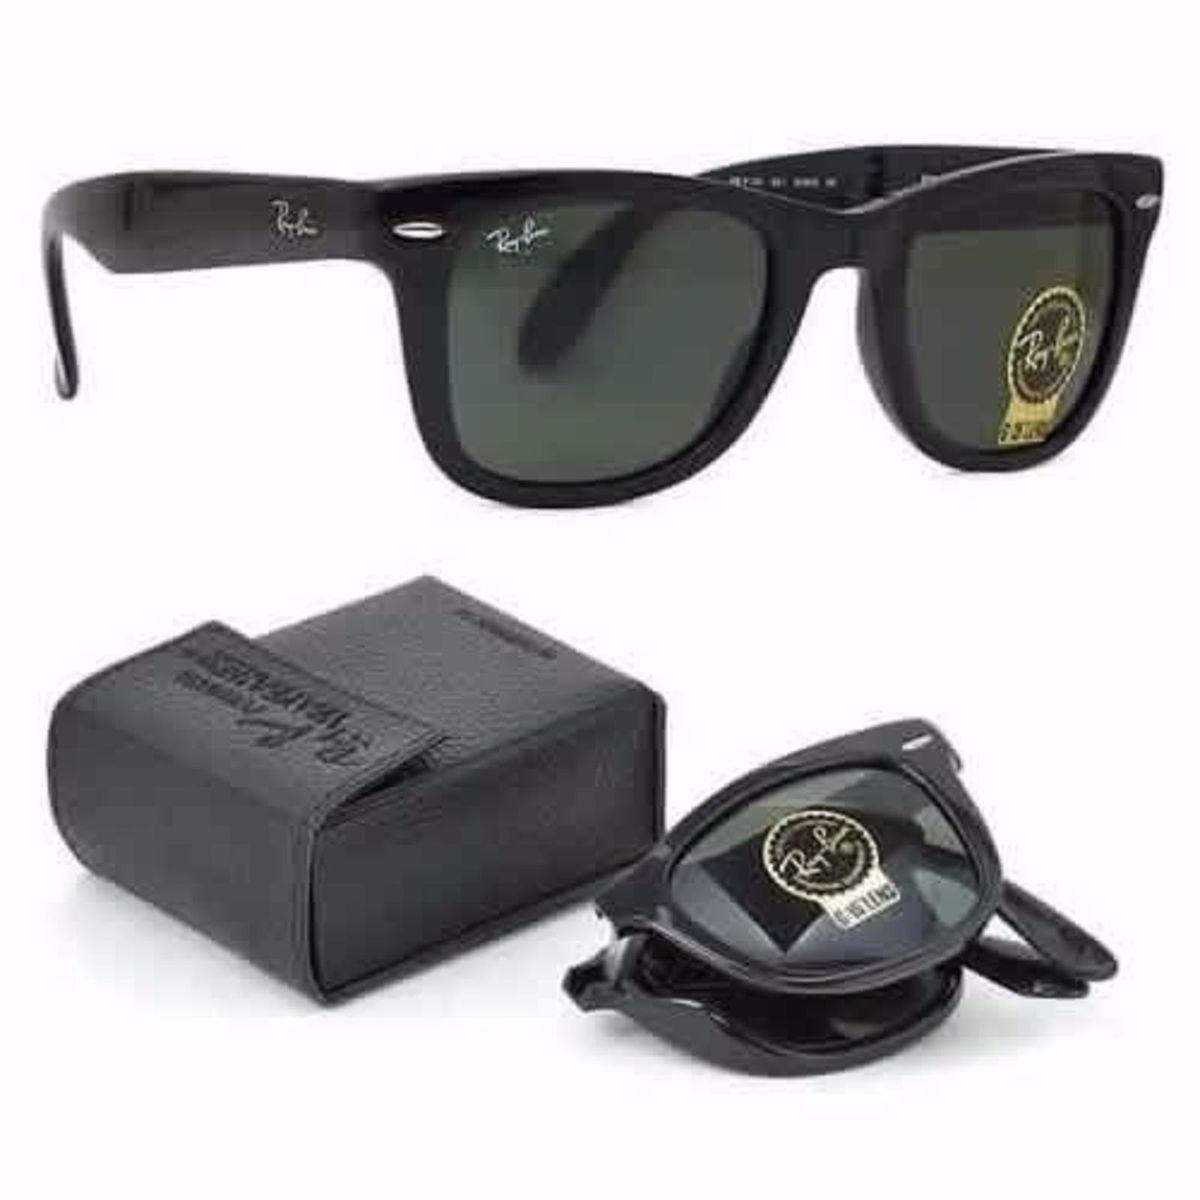 8d11129b8 Óculos de Sol Ray Ban Wayfarer Dobrável Rb4105   Óculos Feminino Ray Ban  Nunca Usado 20391916   enjoei